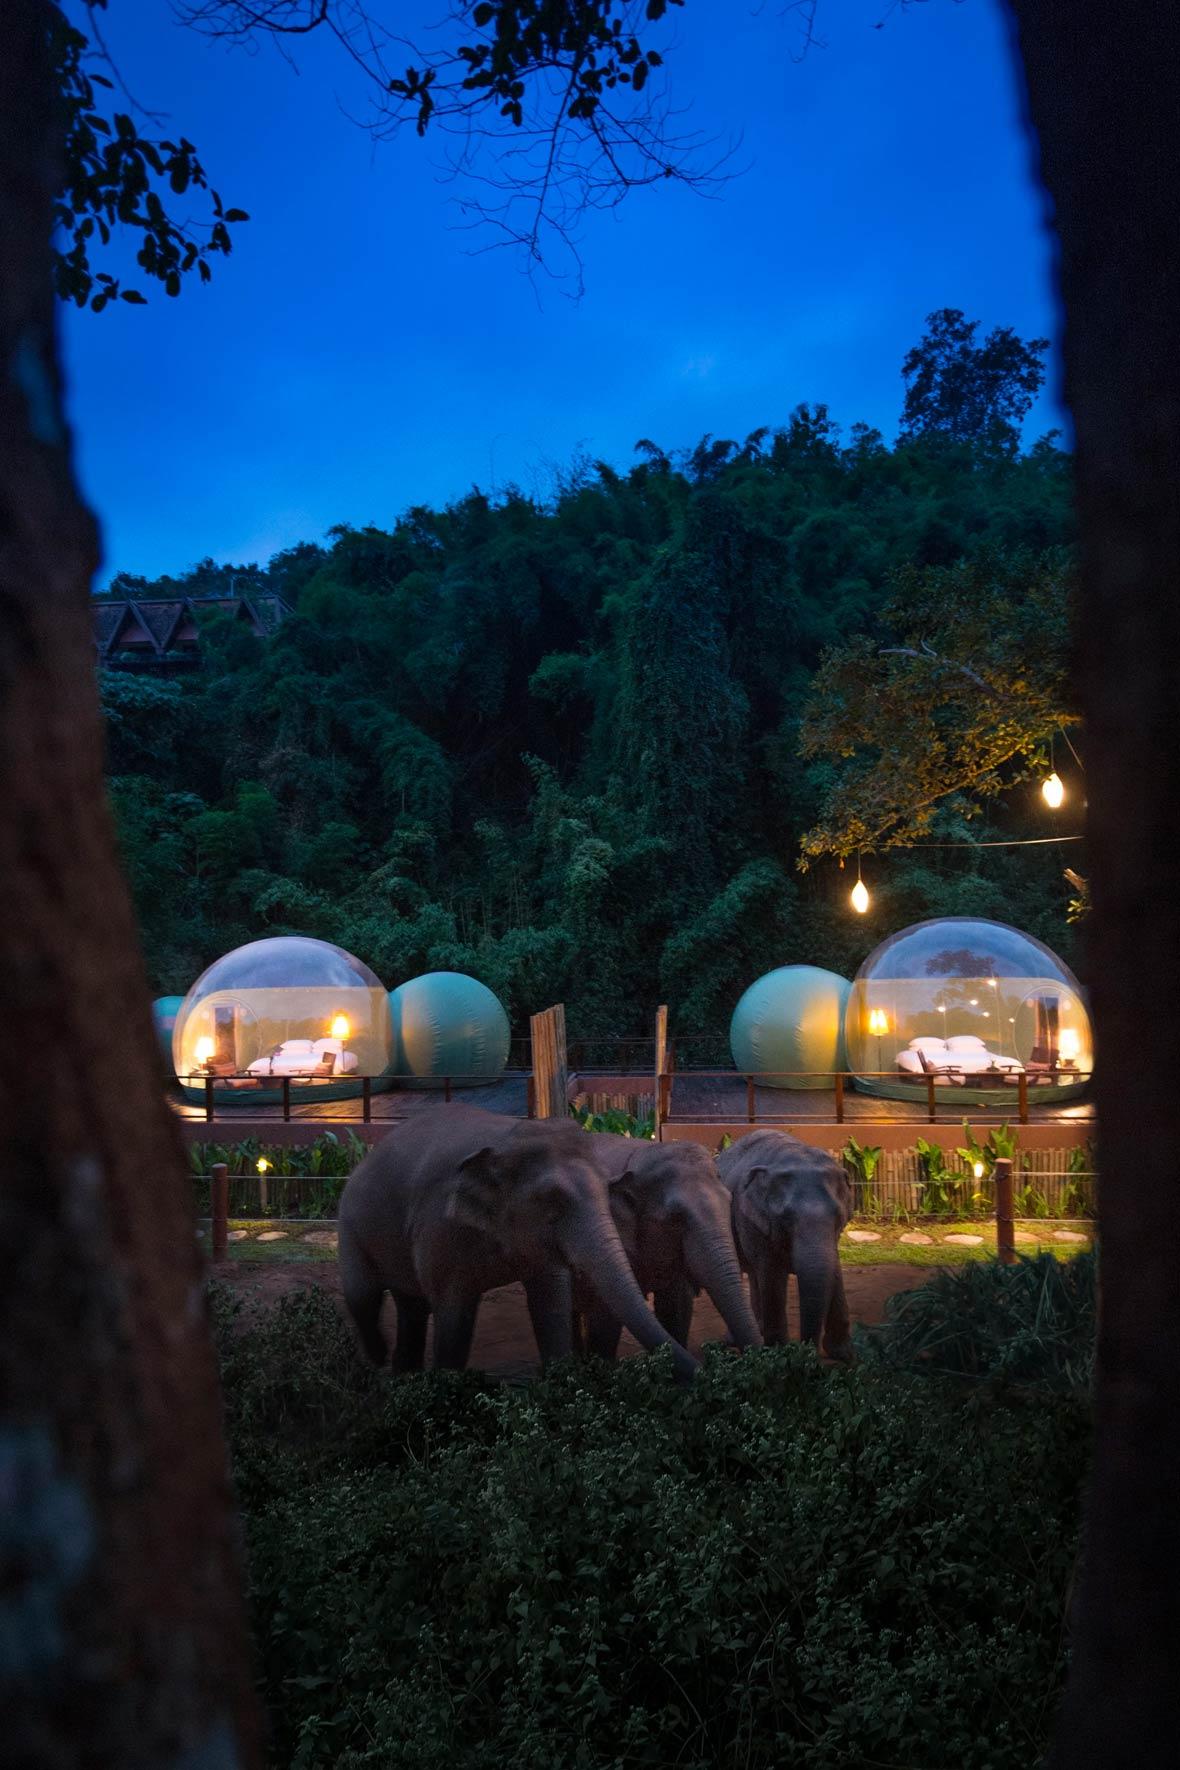 Anantara-Elephant-Camp-2